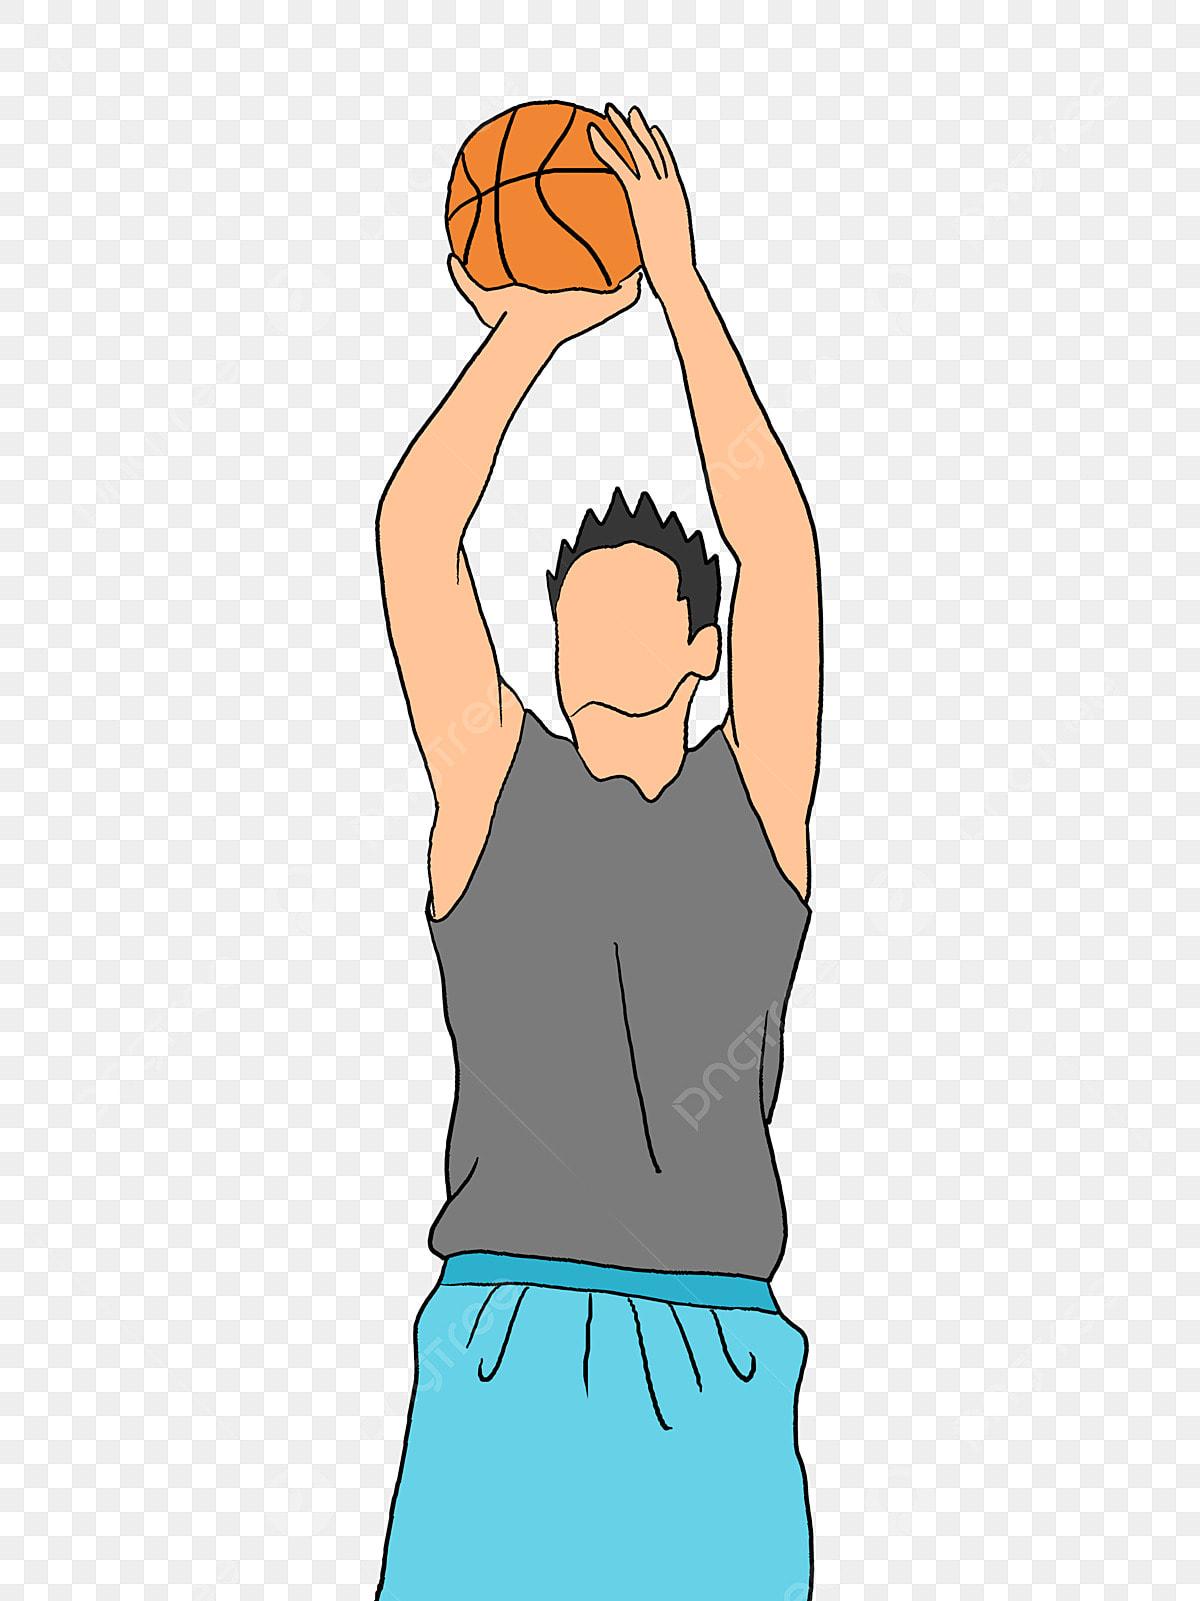 Happy Cute Kid Girl Play Basketball Royalty Free Cliparts, Vectors, And  Stock Illustration. Image 138518267.